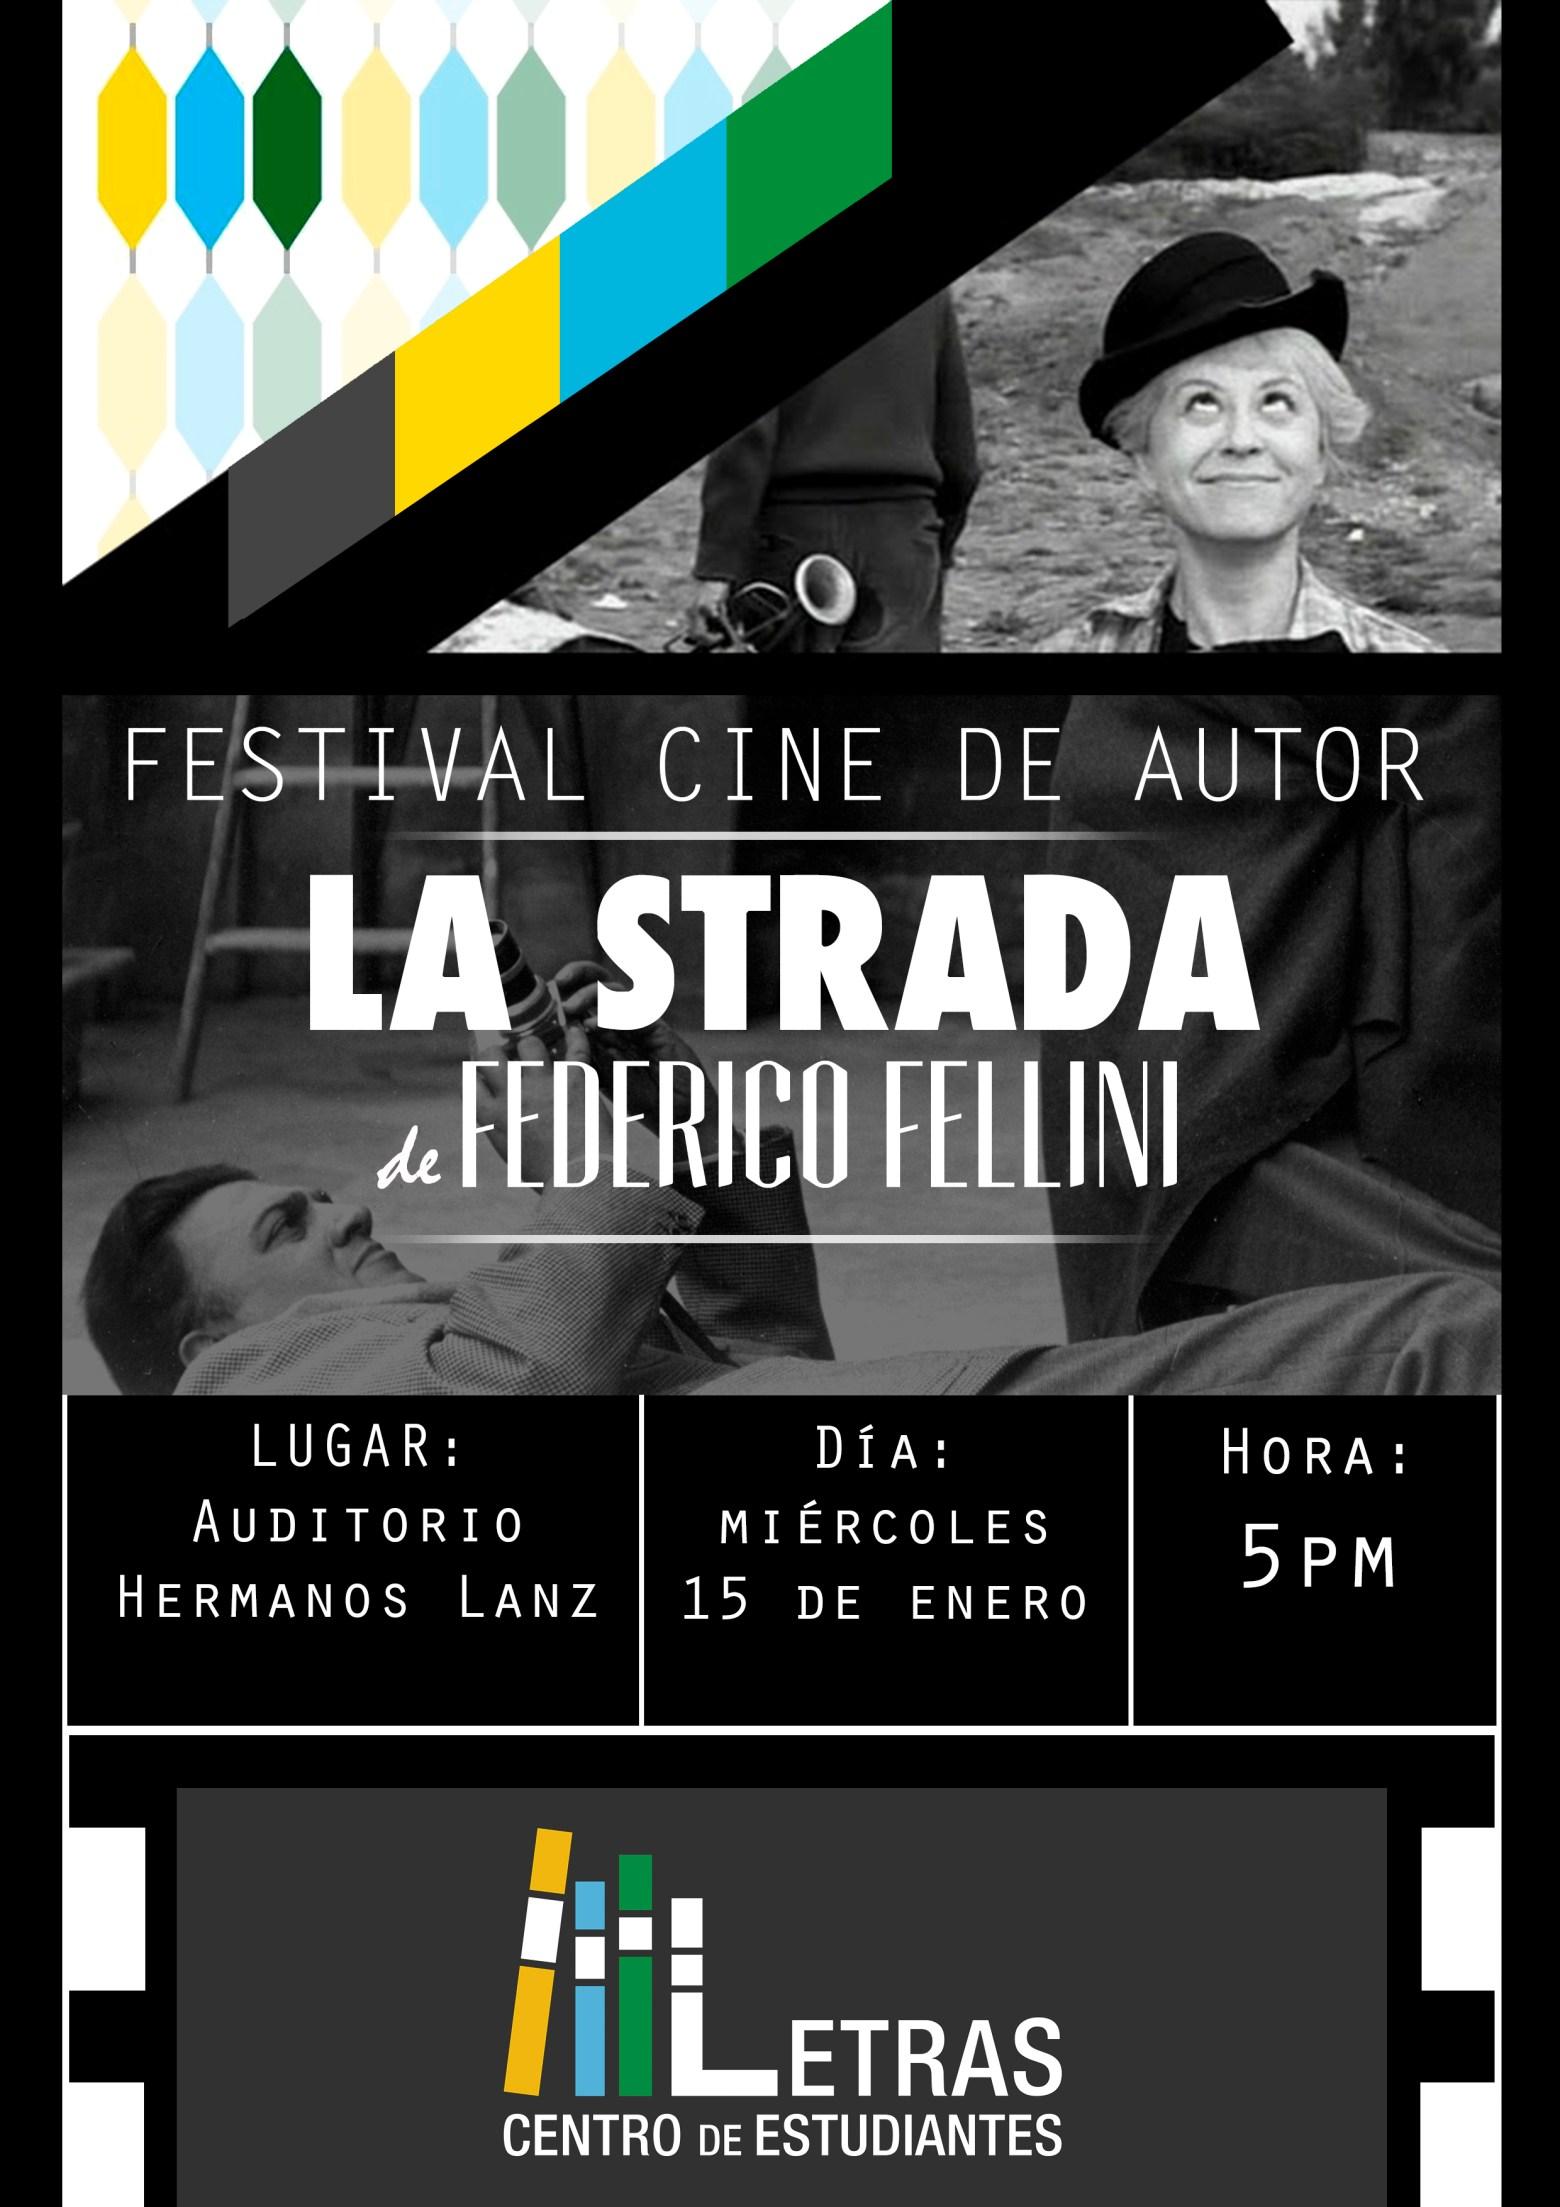 Festival Cine de Autor: La Strada